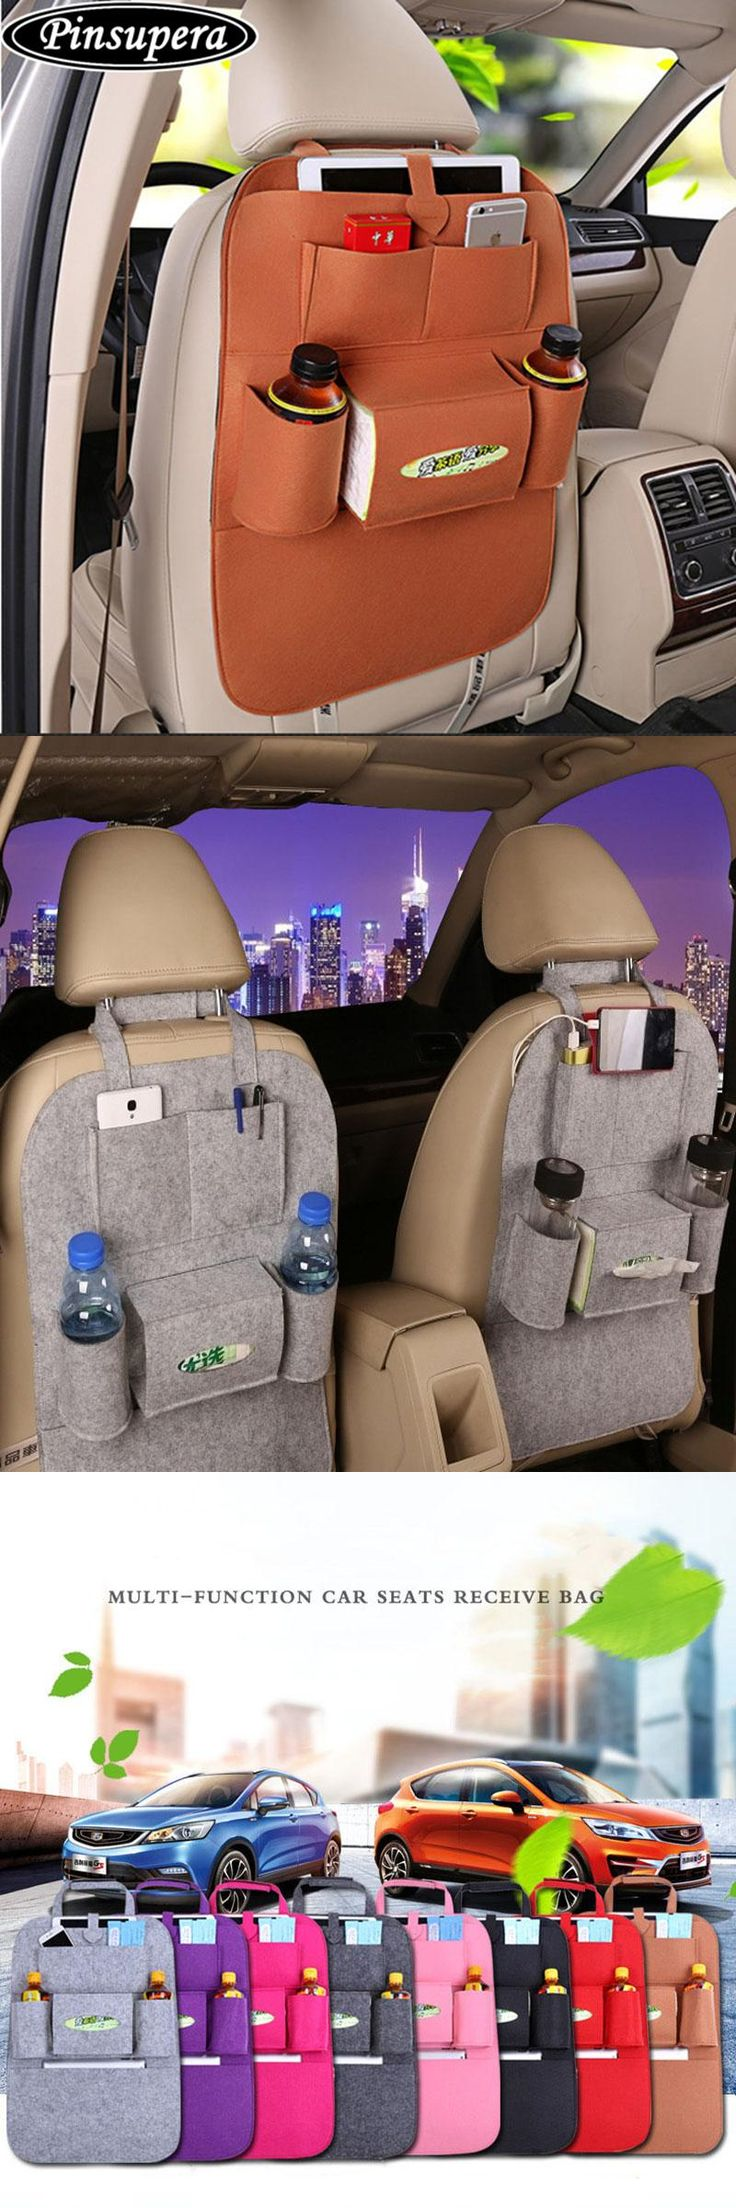 [Visit to Buy] Car Trunk Organizer Sundries Holder Multi-Pocket Travel Storage Bag Hanger Car Covers Seat Organizer in The Trunk Seat Back Bag #Advertisement